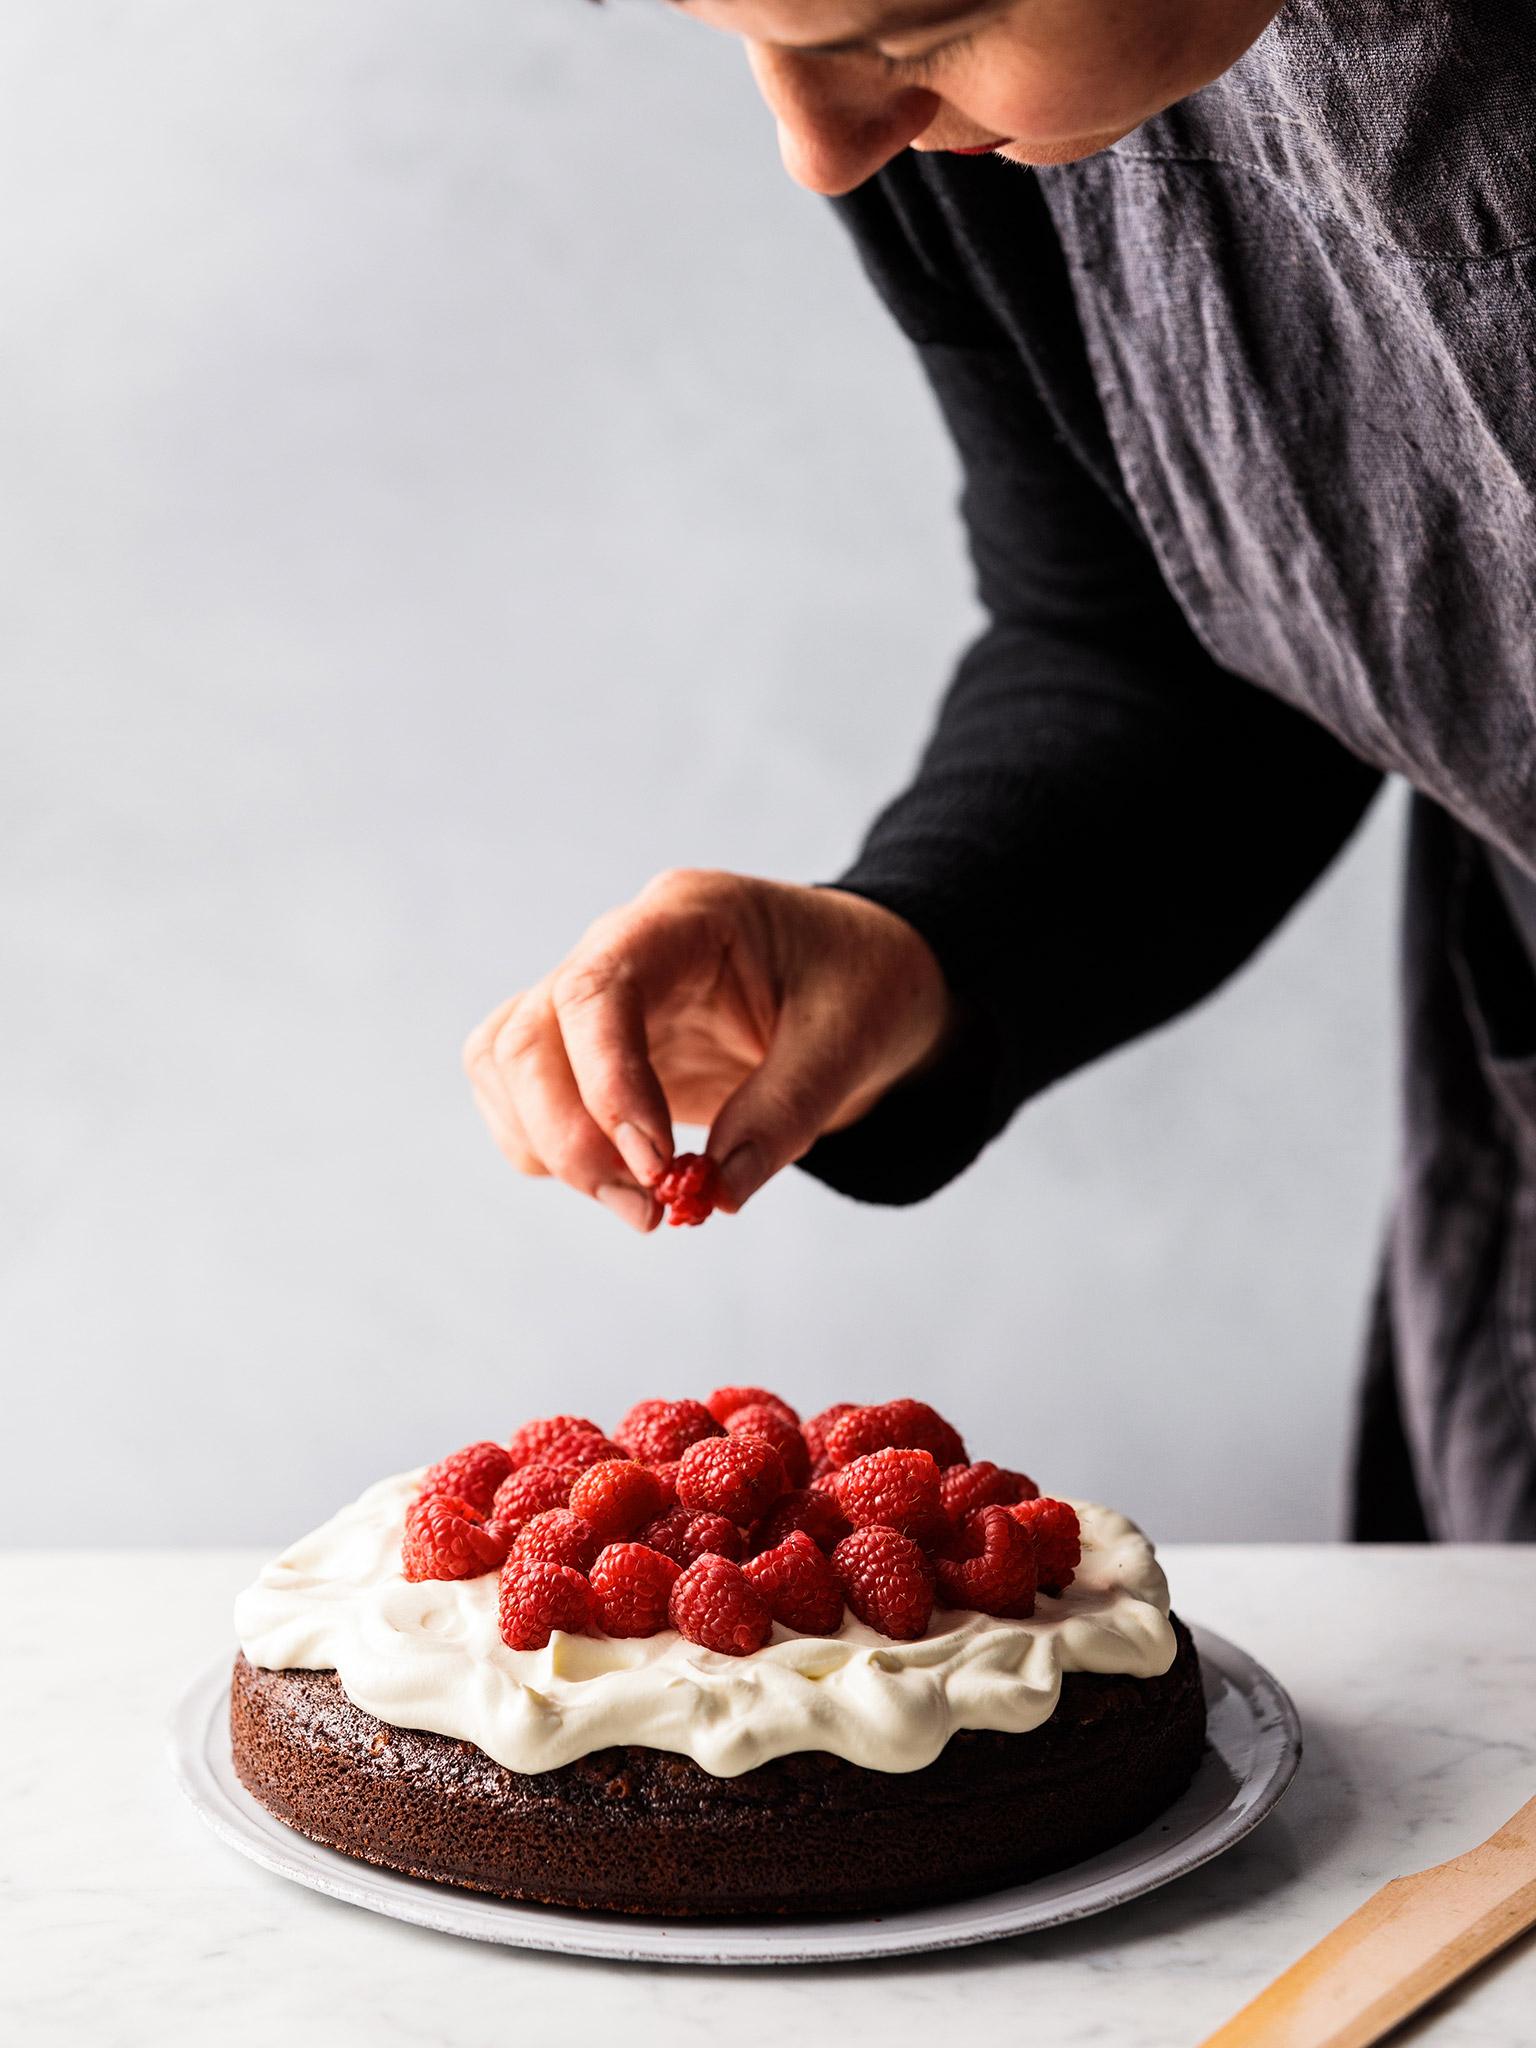 3-196-FourRoses-2-Nannas-Chocolate-Cake-002-web.jpg